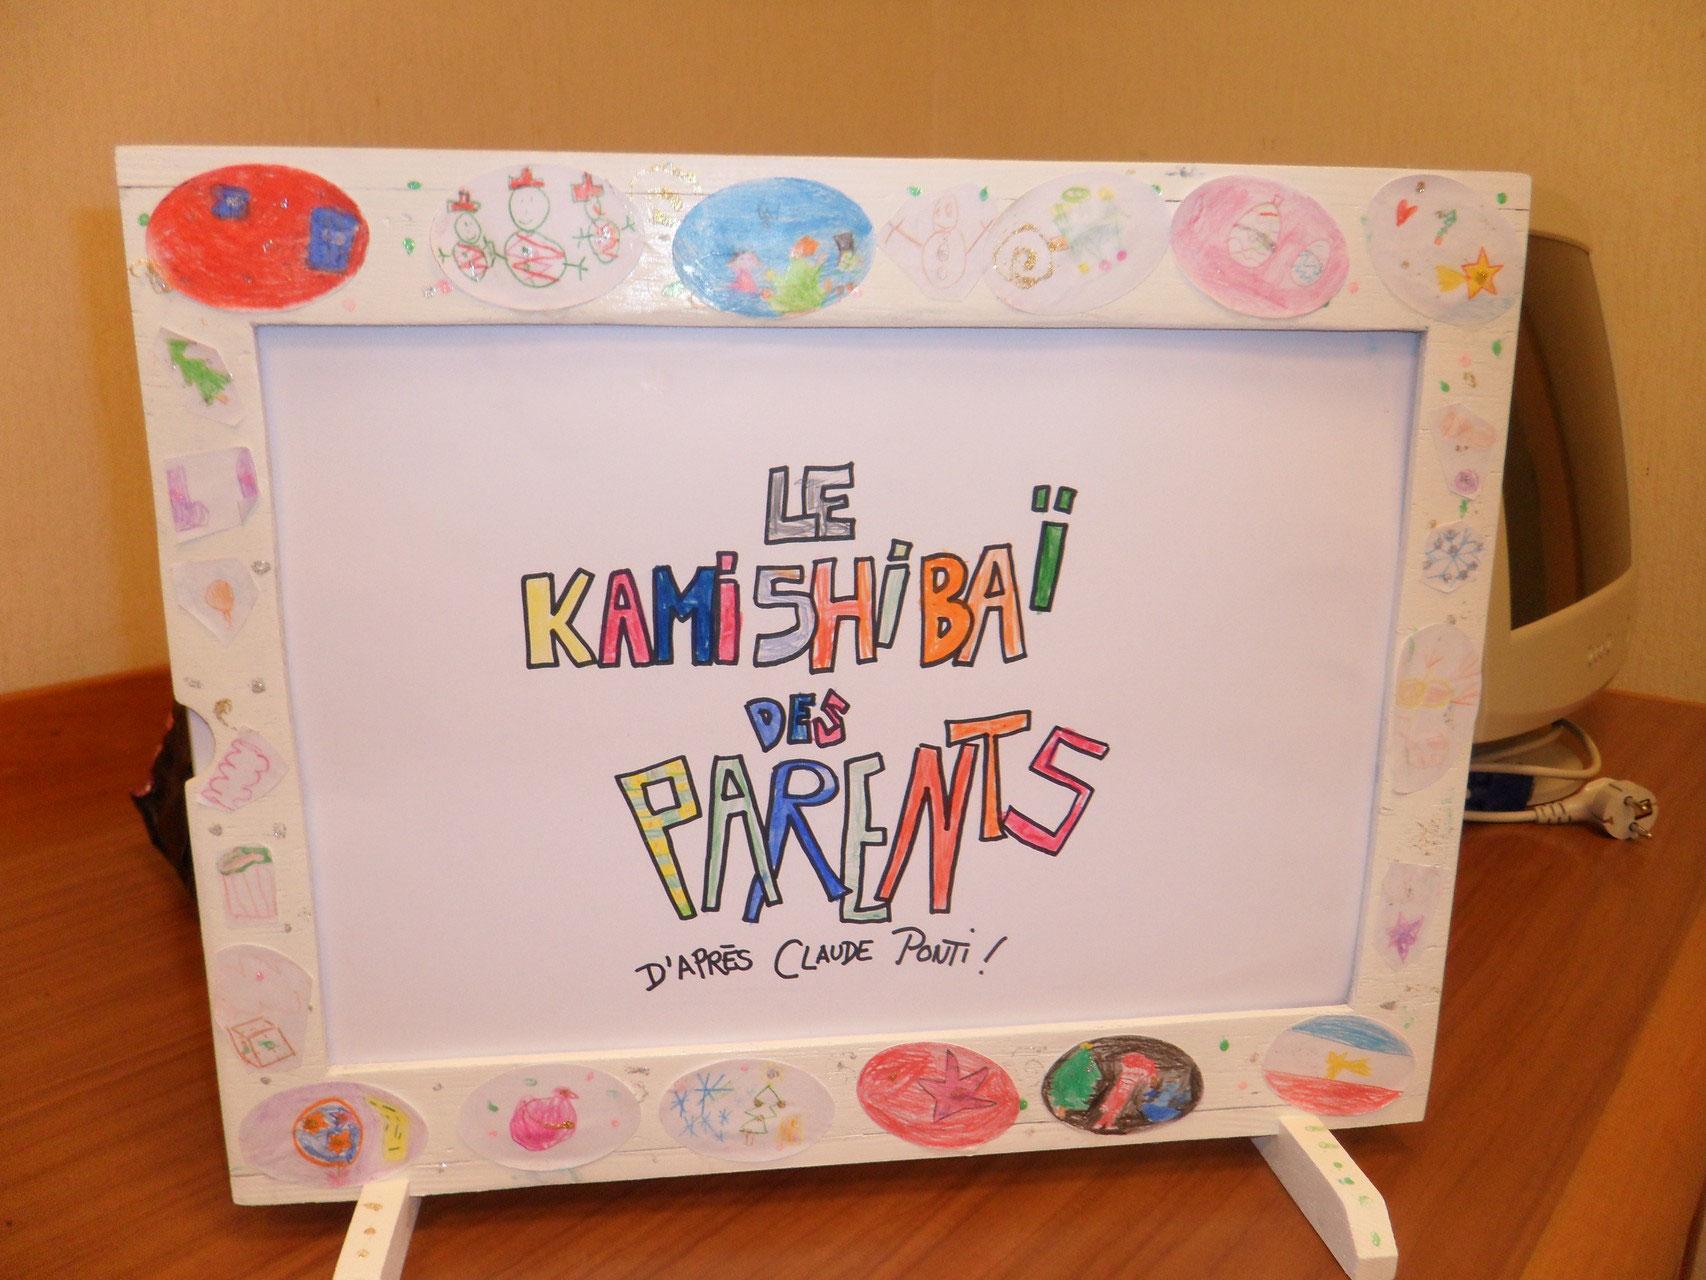 Les Kamishibai Bibliotheque Intercommunale Du Verteillacois